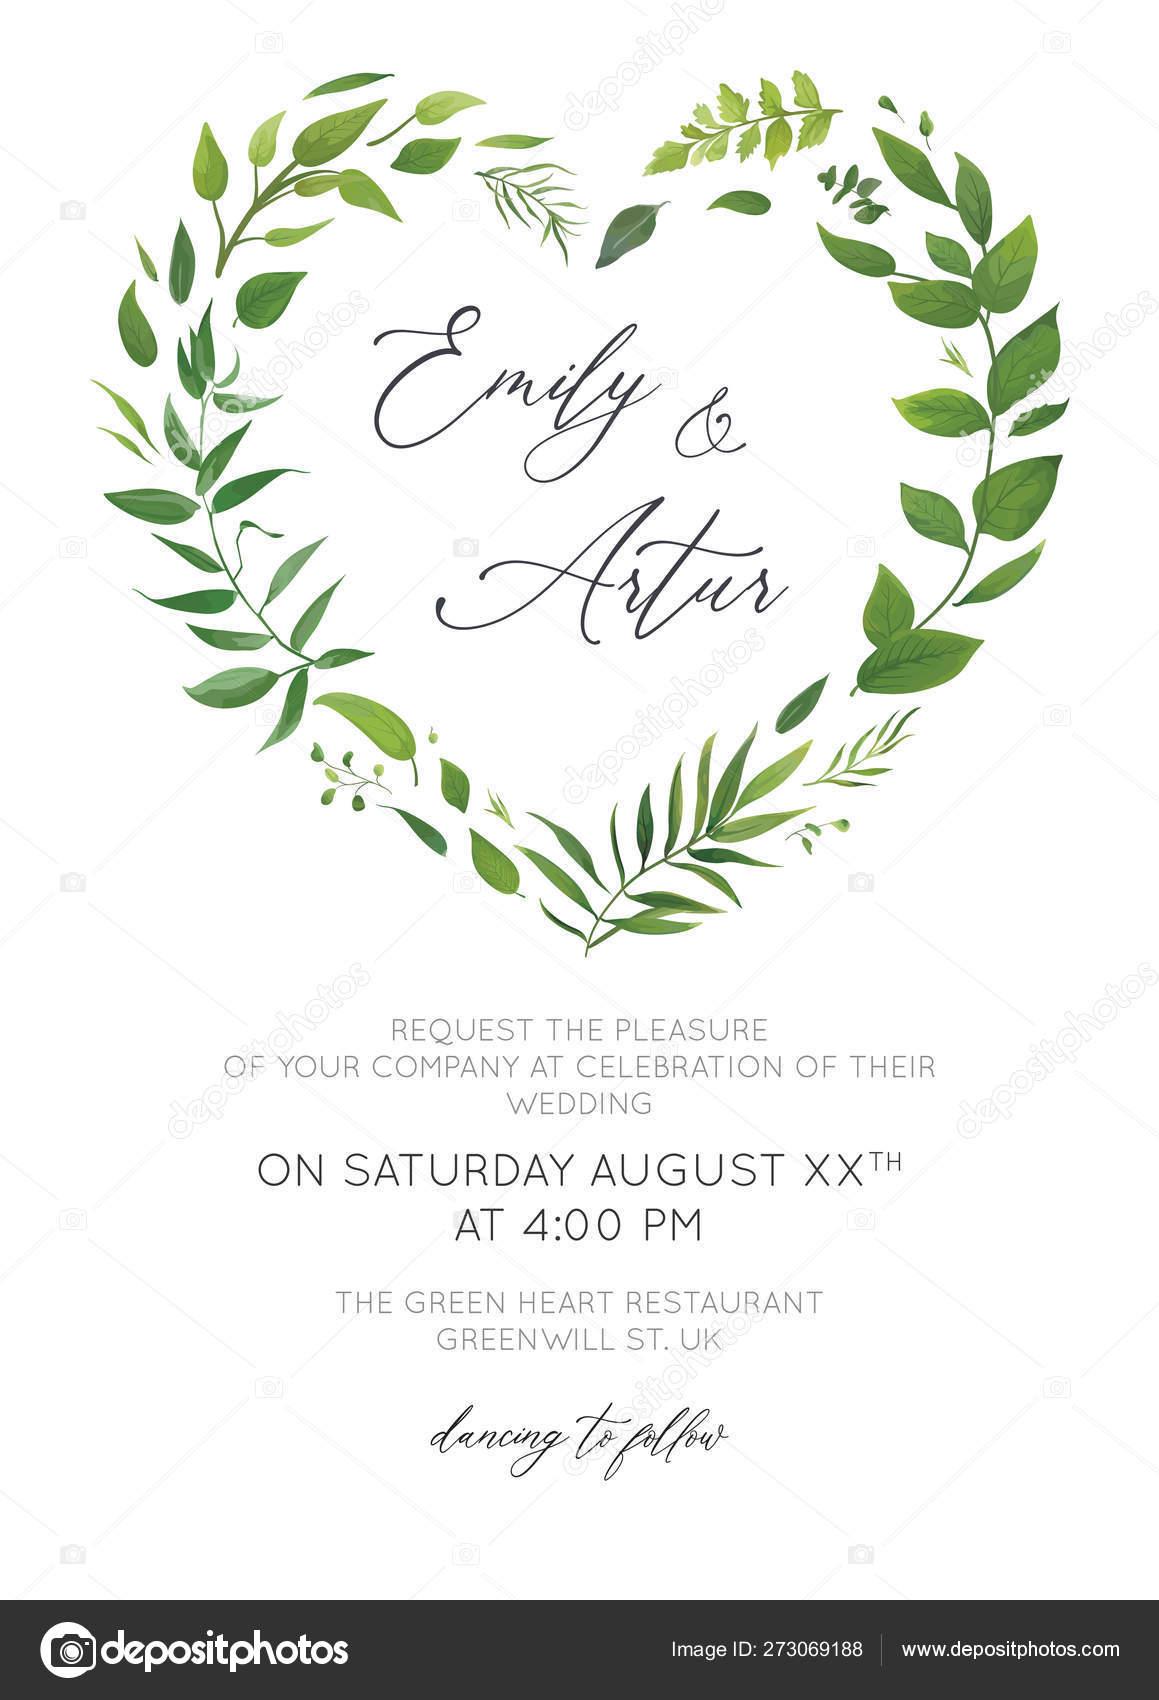 Greenery Wedding invitation Wedding invitations Botanical LEAFY Wedding invite Invitation template